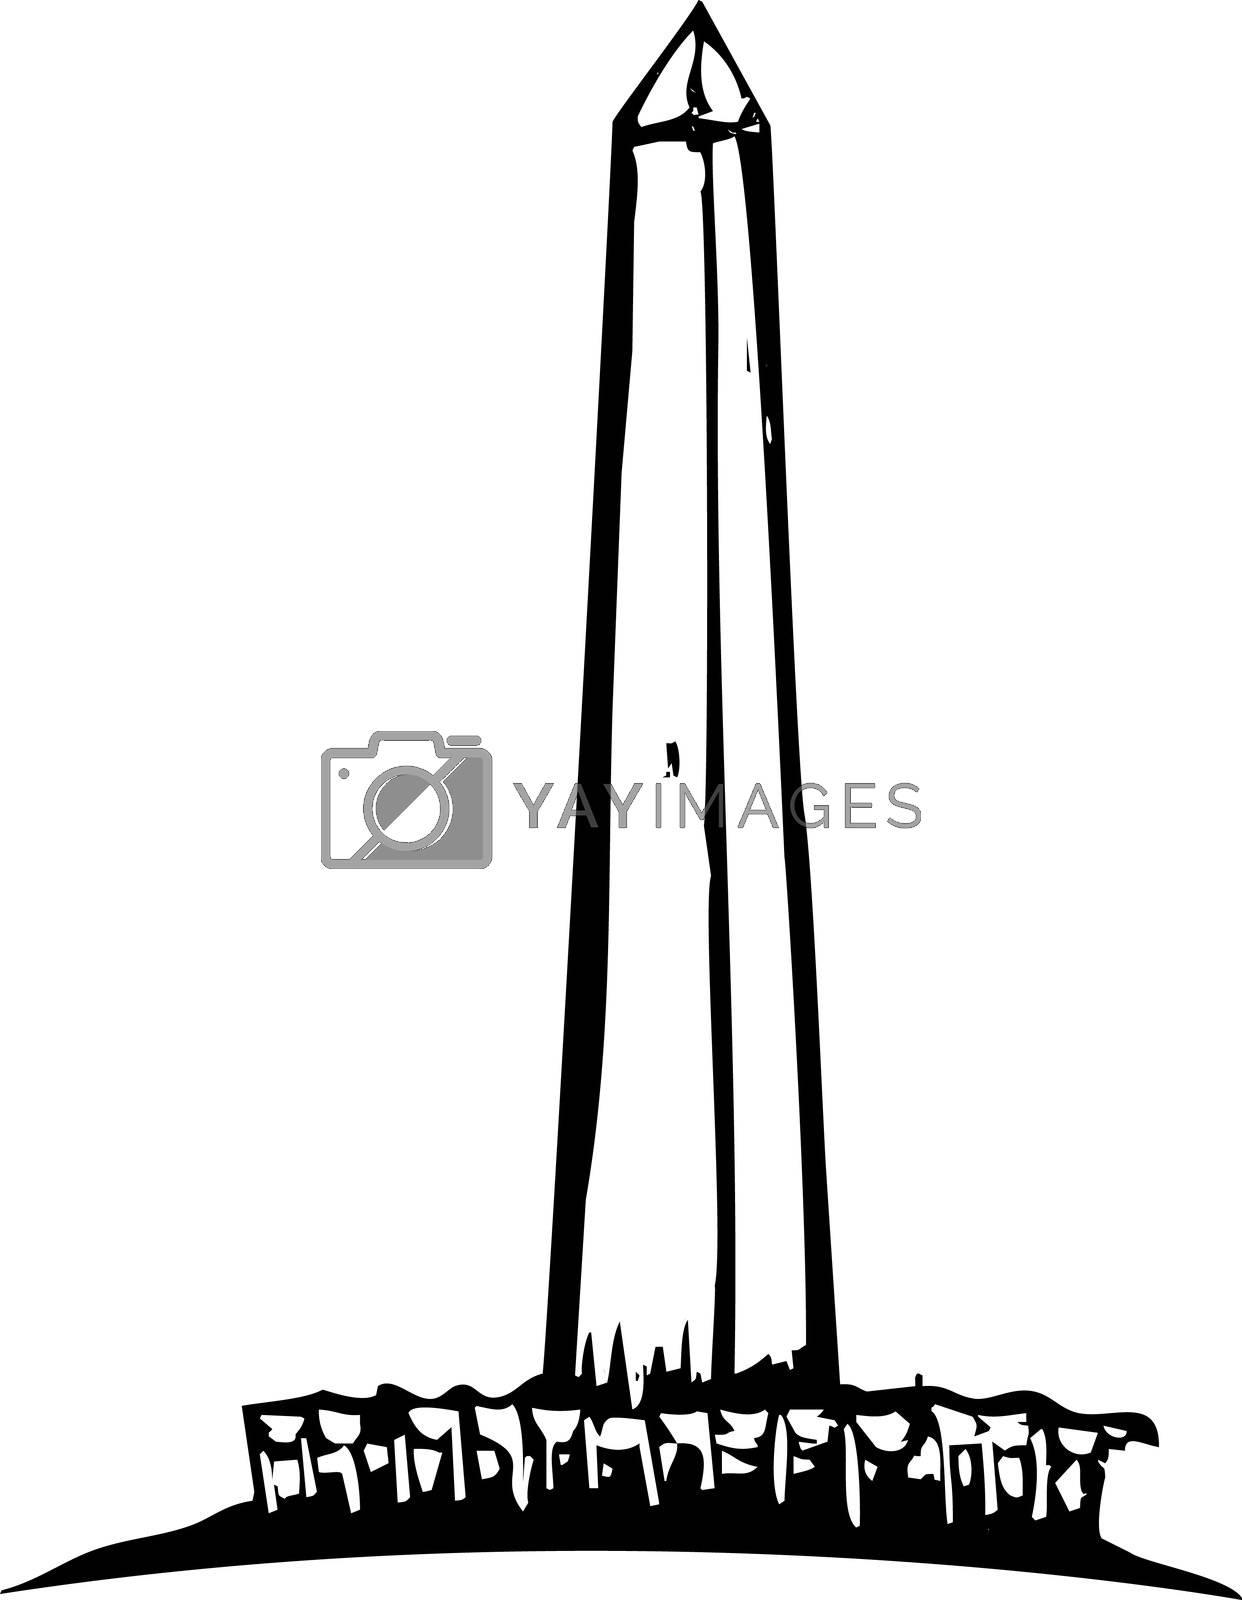 Washington Monument by Xochicalco